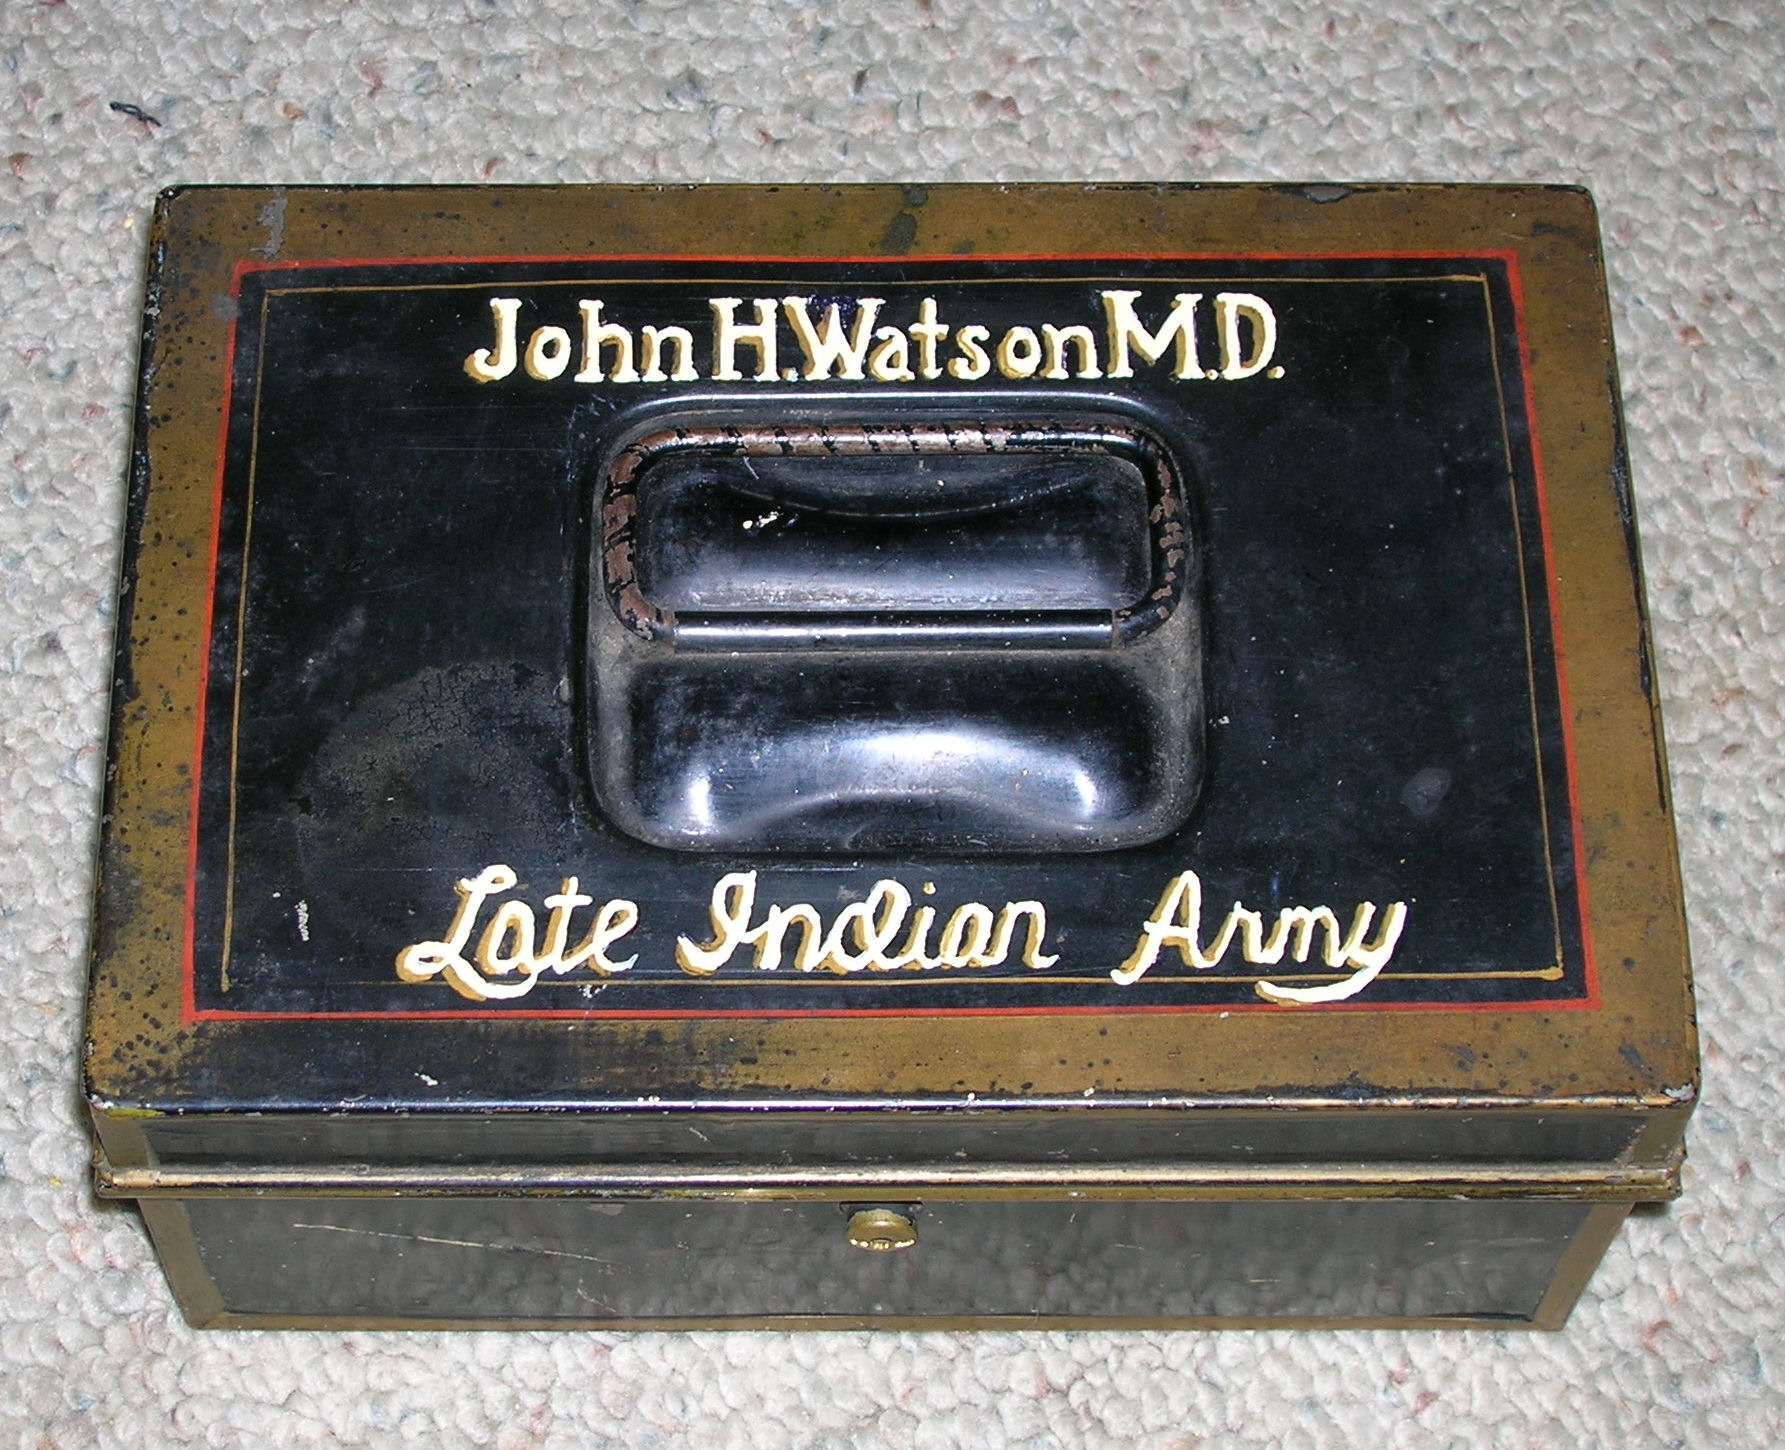 From Watson's Tin Box – The Stockbroker's Clerk